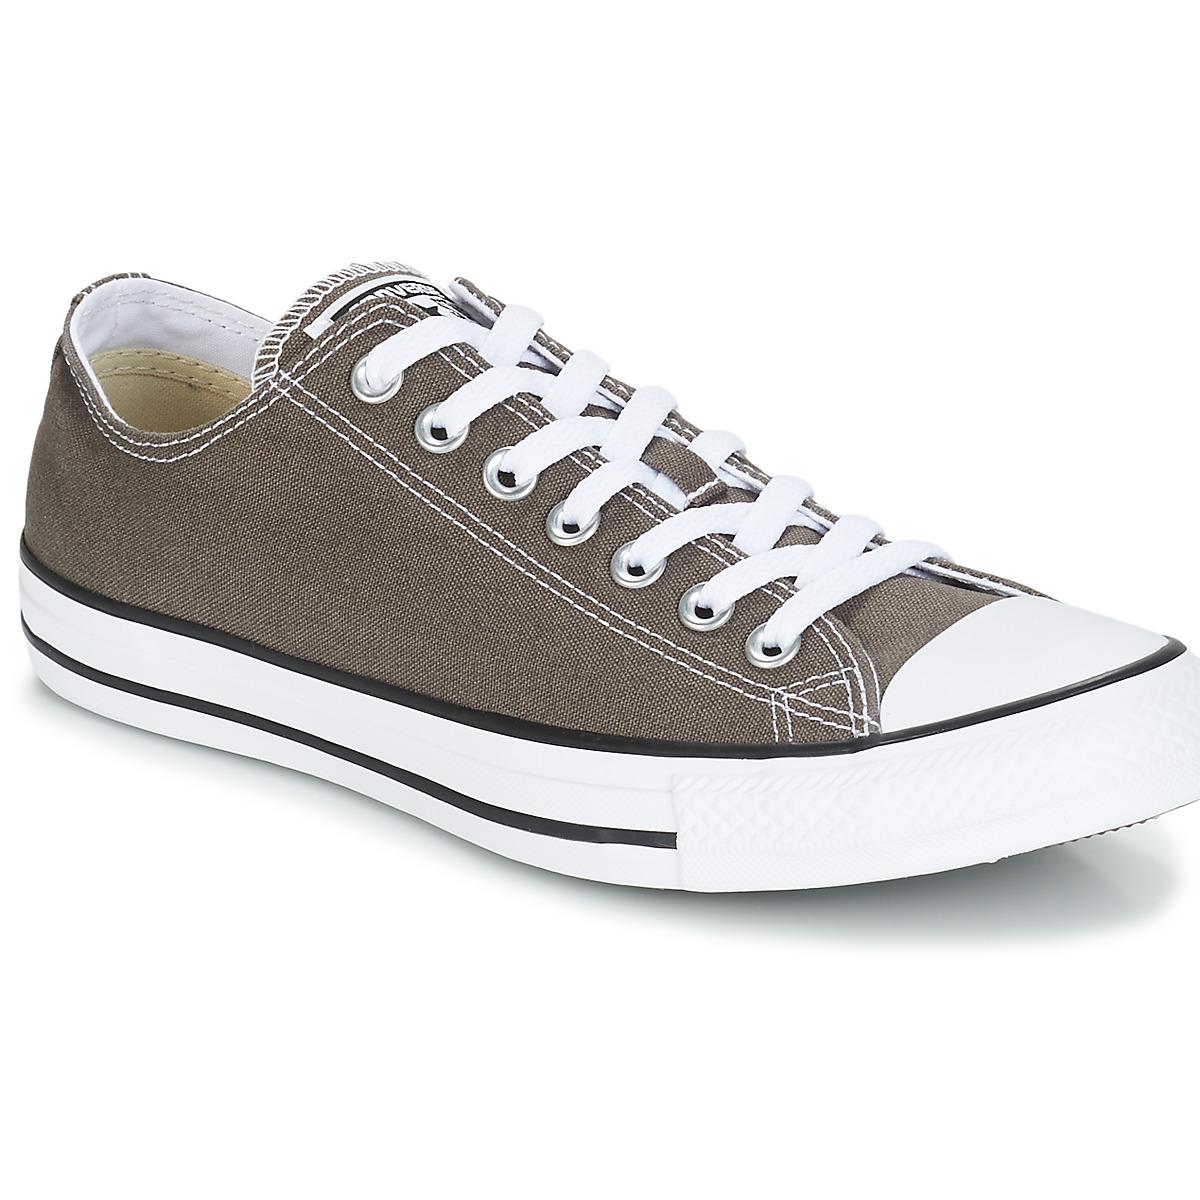 Converse CHUCK TAYLOR ALL STAR SEAS OX Anthrazit - Kostenloser Versand bei Spartoode ! - Schuhe Sneaker Low  51,99 €